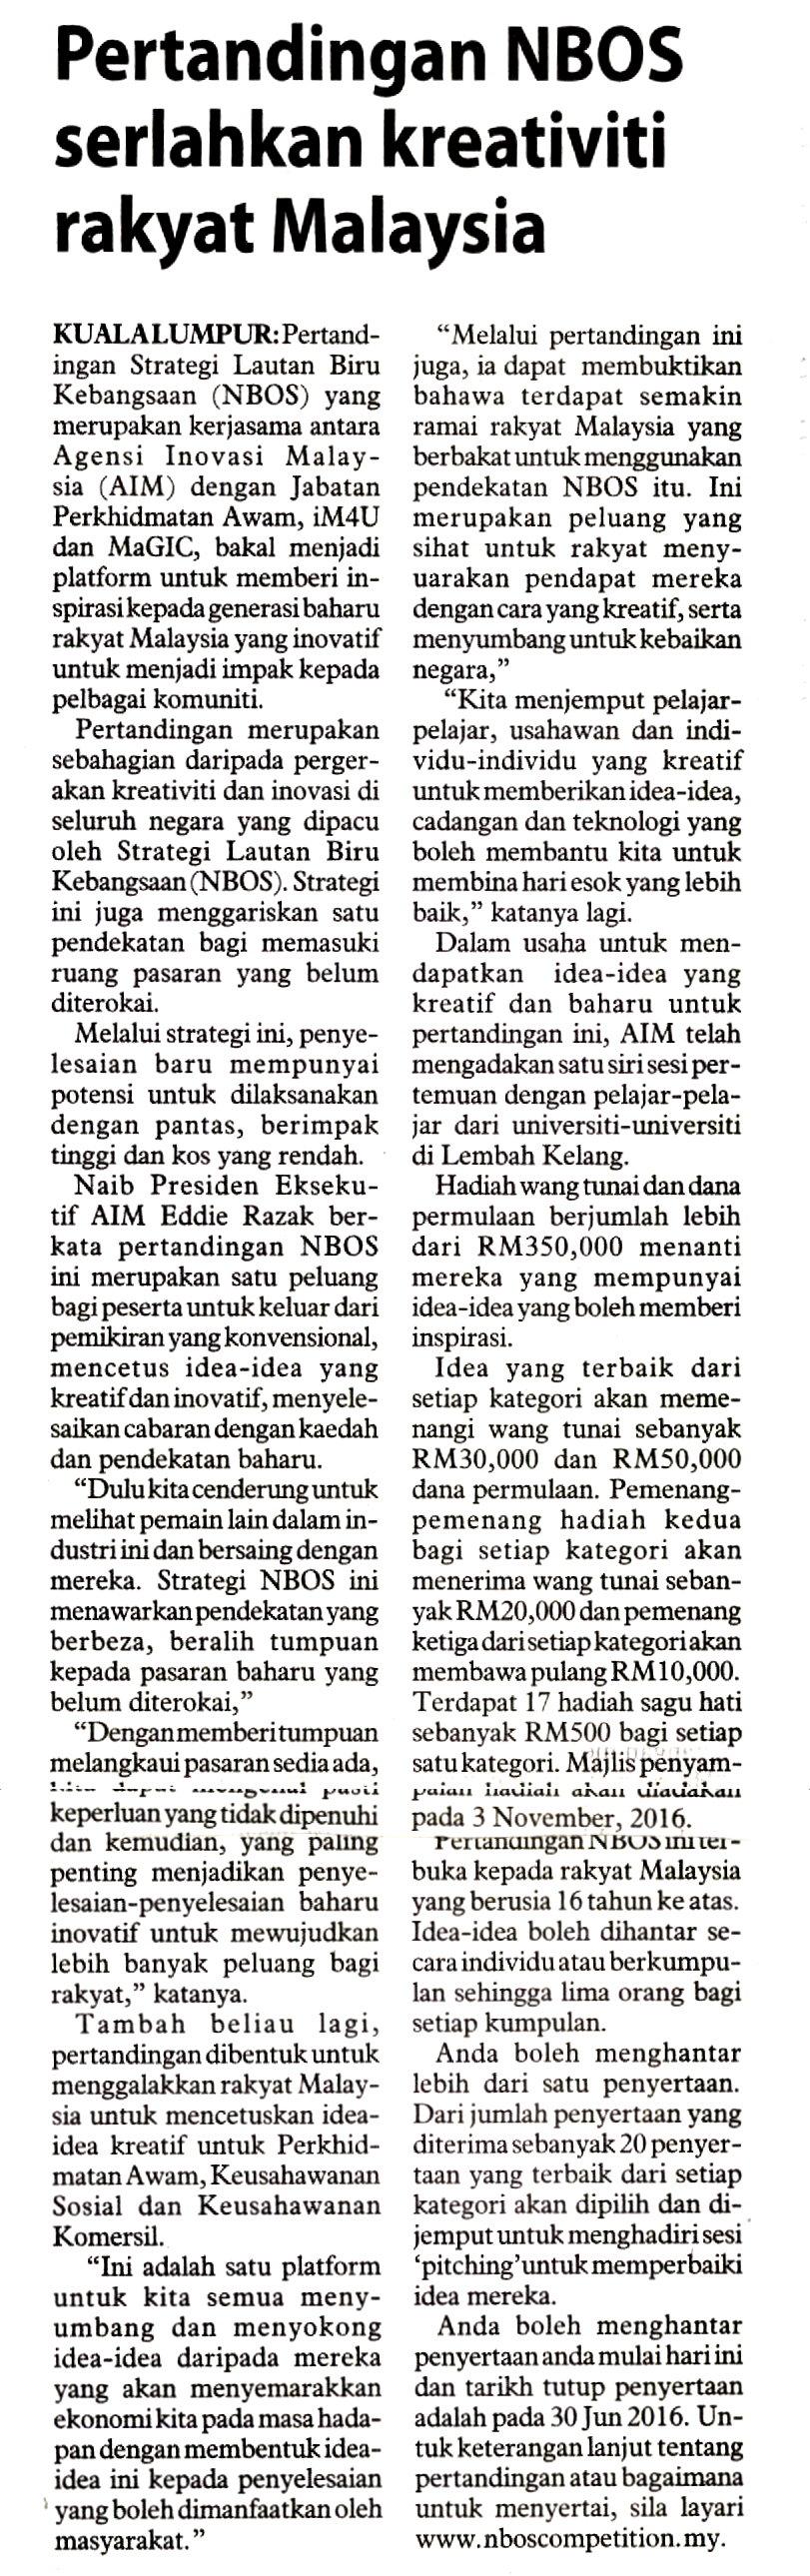 eddie-razak-utusan-borneo-sarawak-pertandingan-nbos-serlahkan-kreativiti-rakyat-malaysia-160819